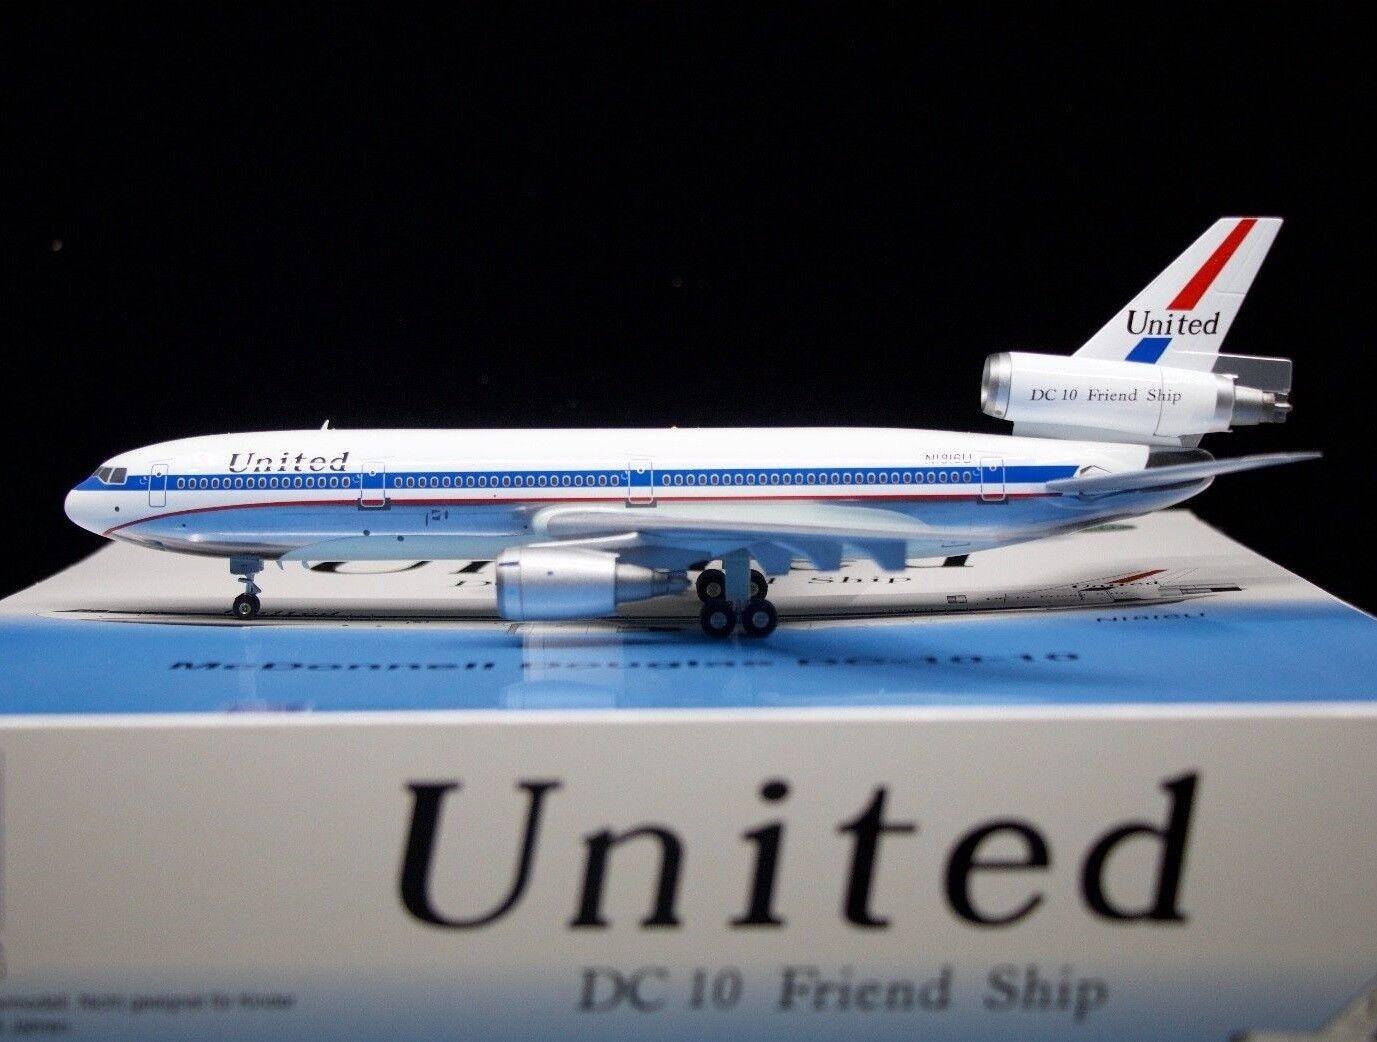 Fertilizantes 100517PA 1 200 United Airlines DC-10-10 N1816U barco amigo Pulido Con Soporte